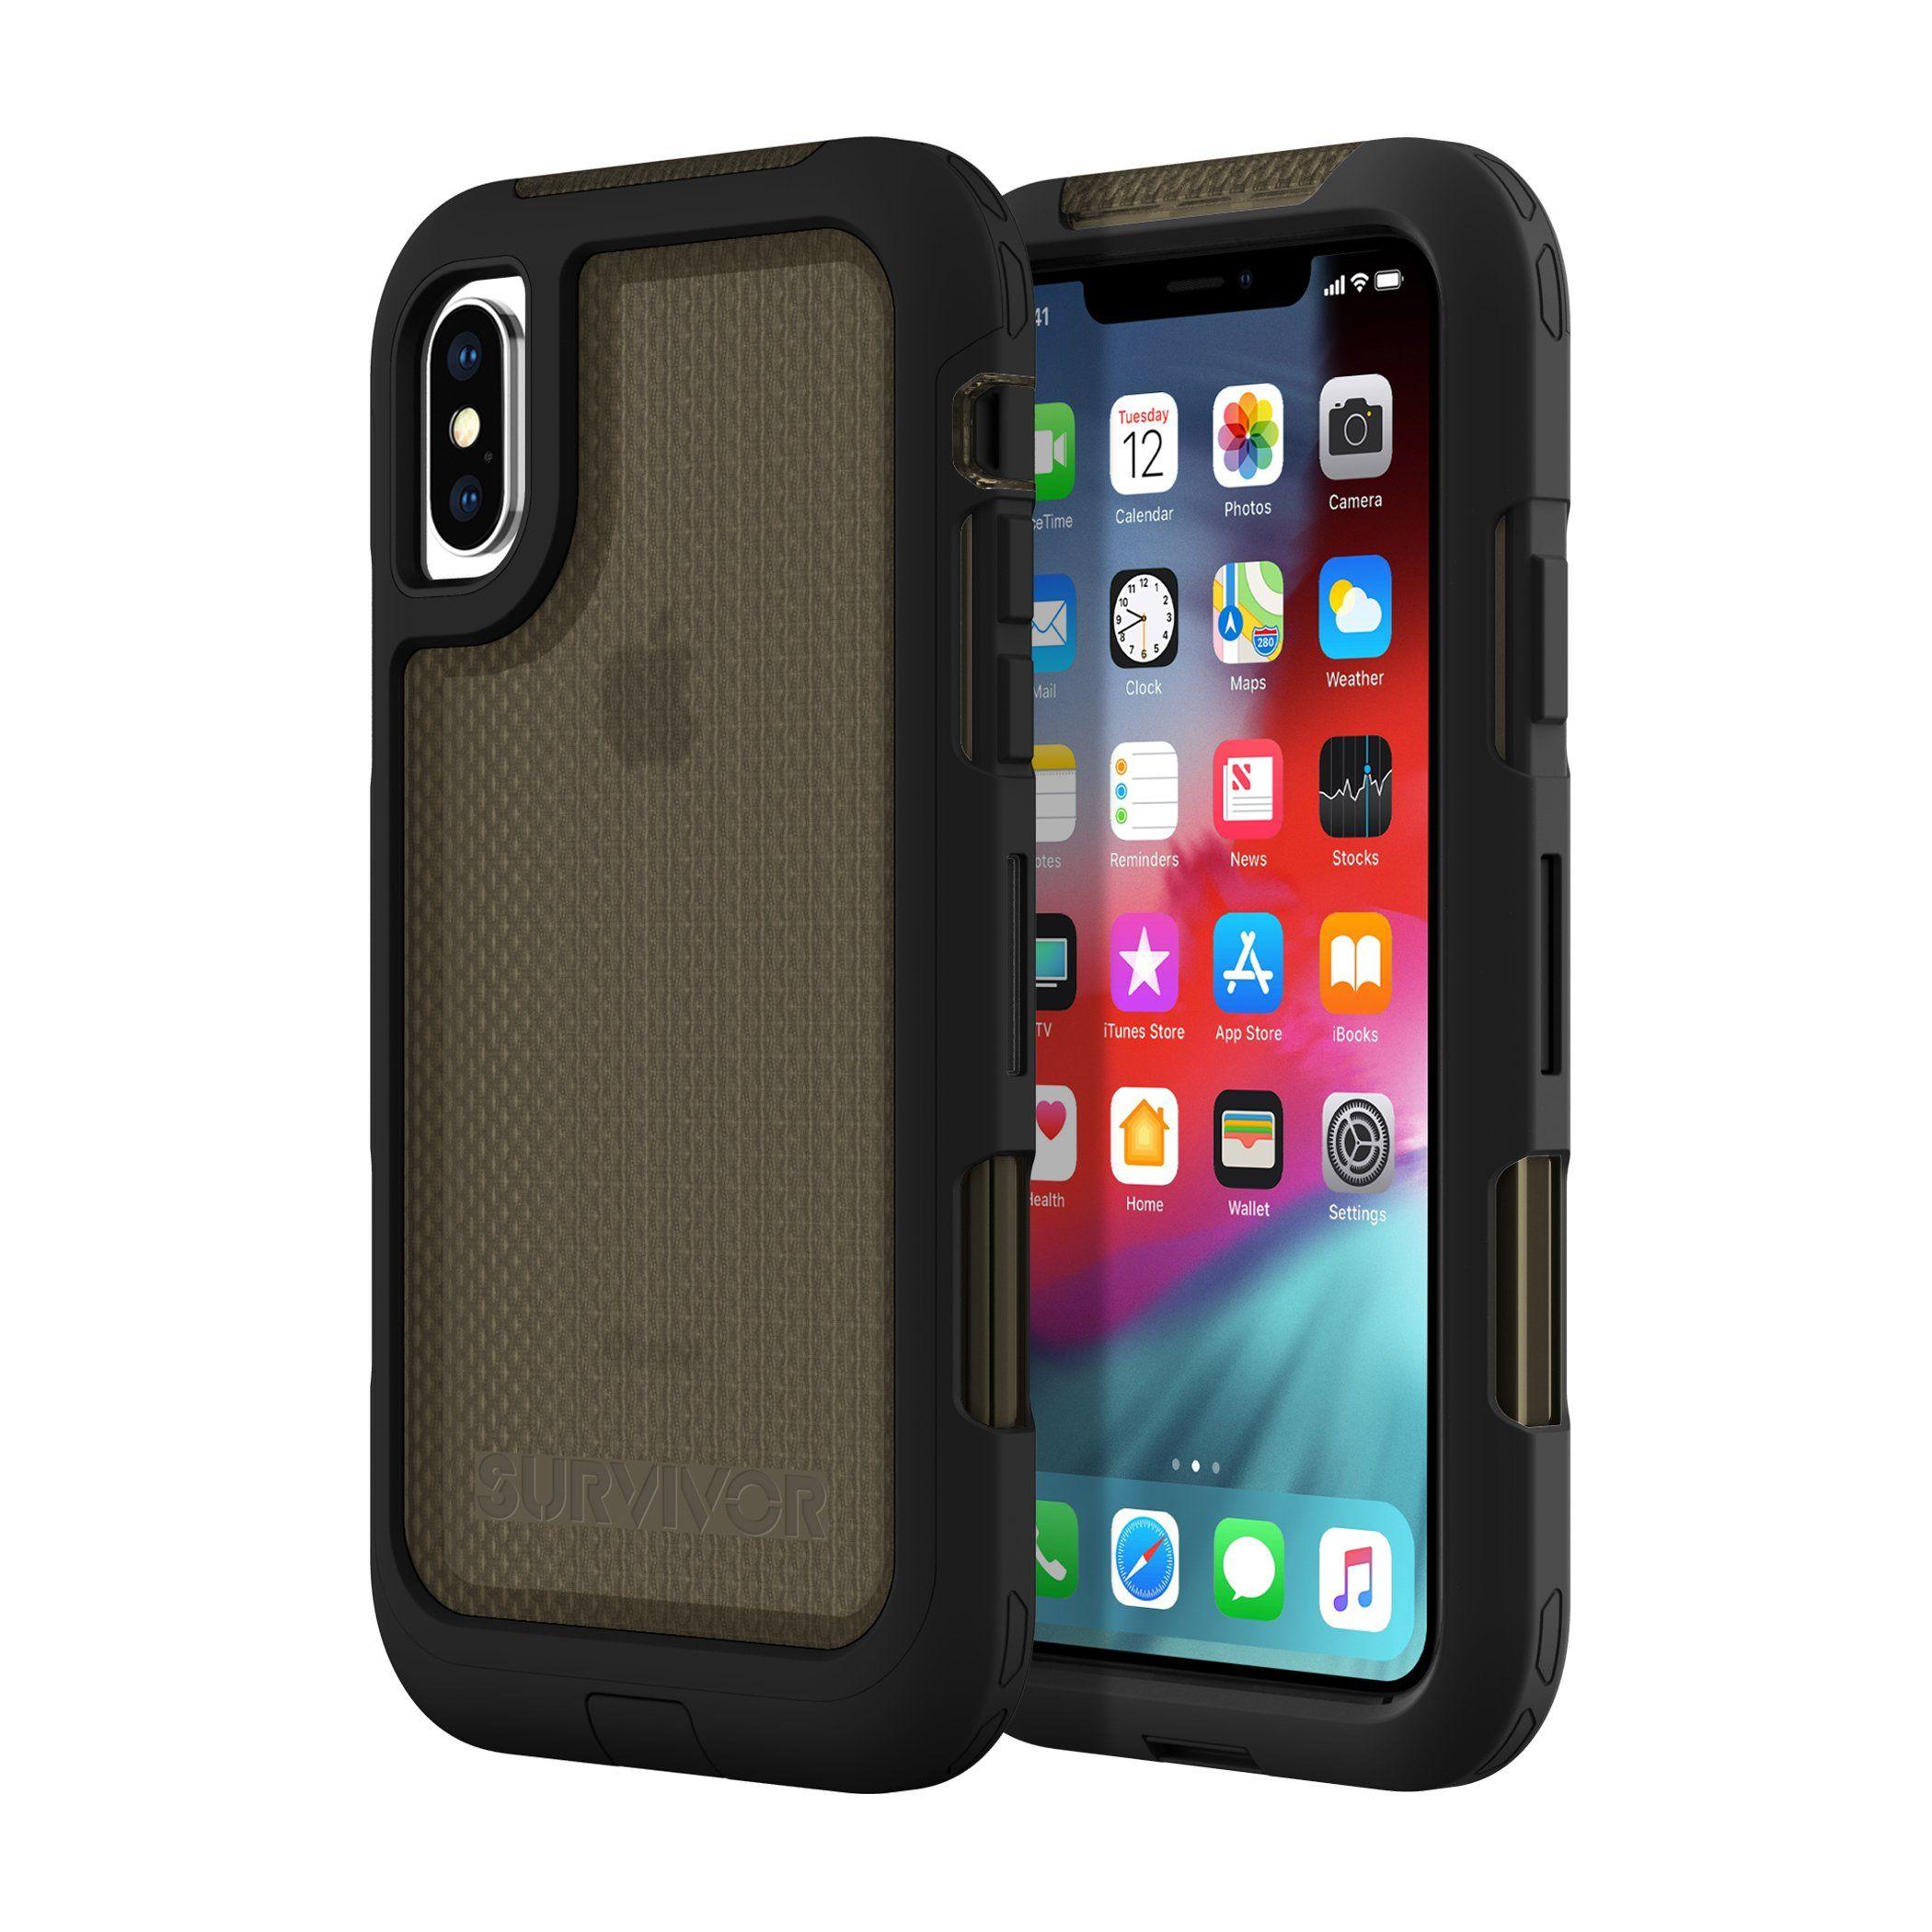 Griffin survivor extreme protective case black for iphone